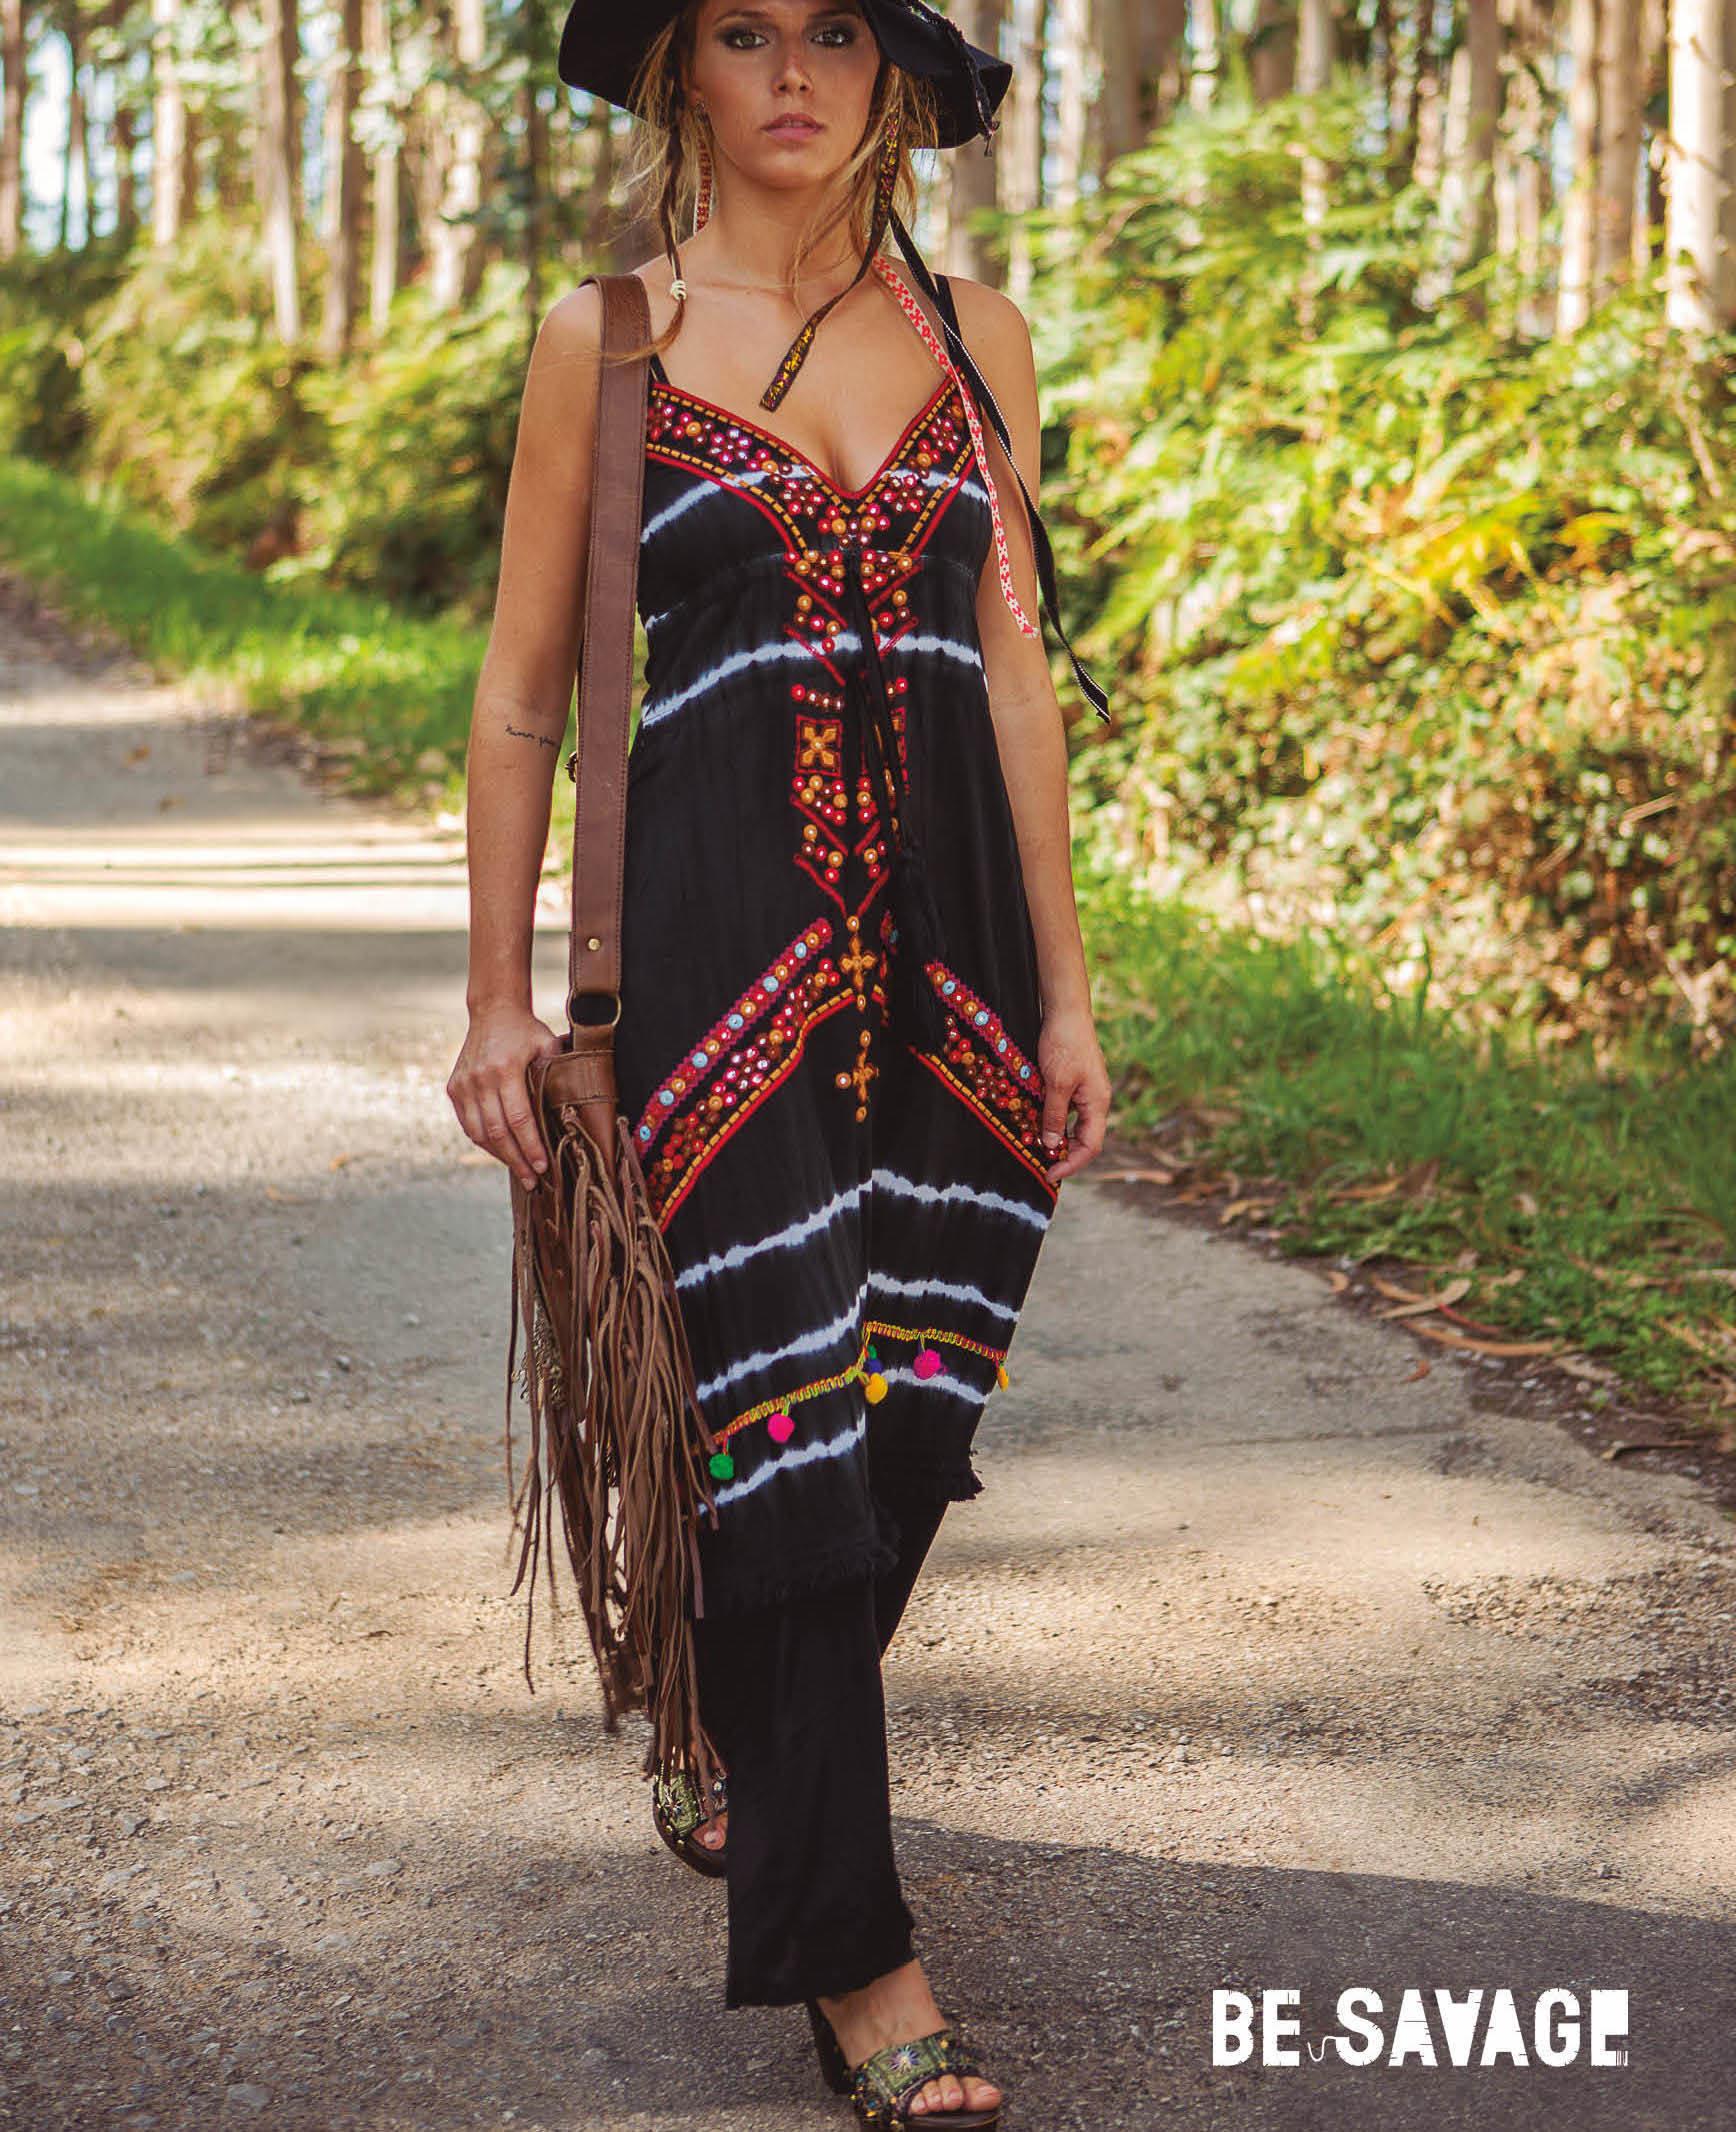 Savage Culture: Sweetheart Fringed Fit & Flare Maxi Dress Portofino II SAVAGE_34131